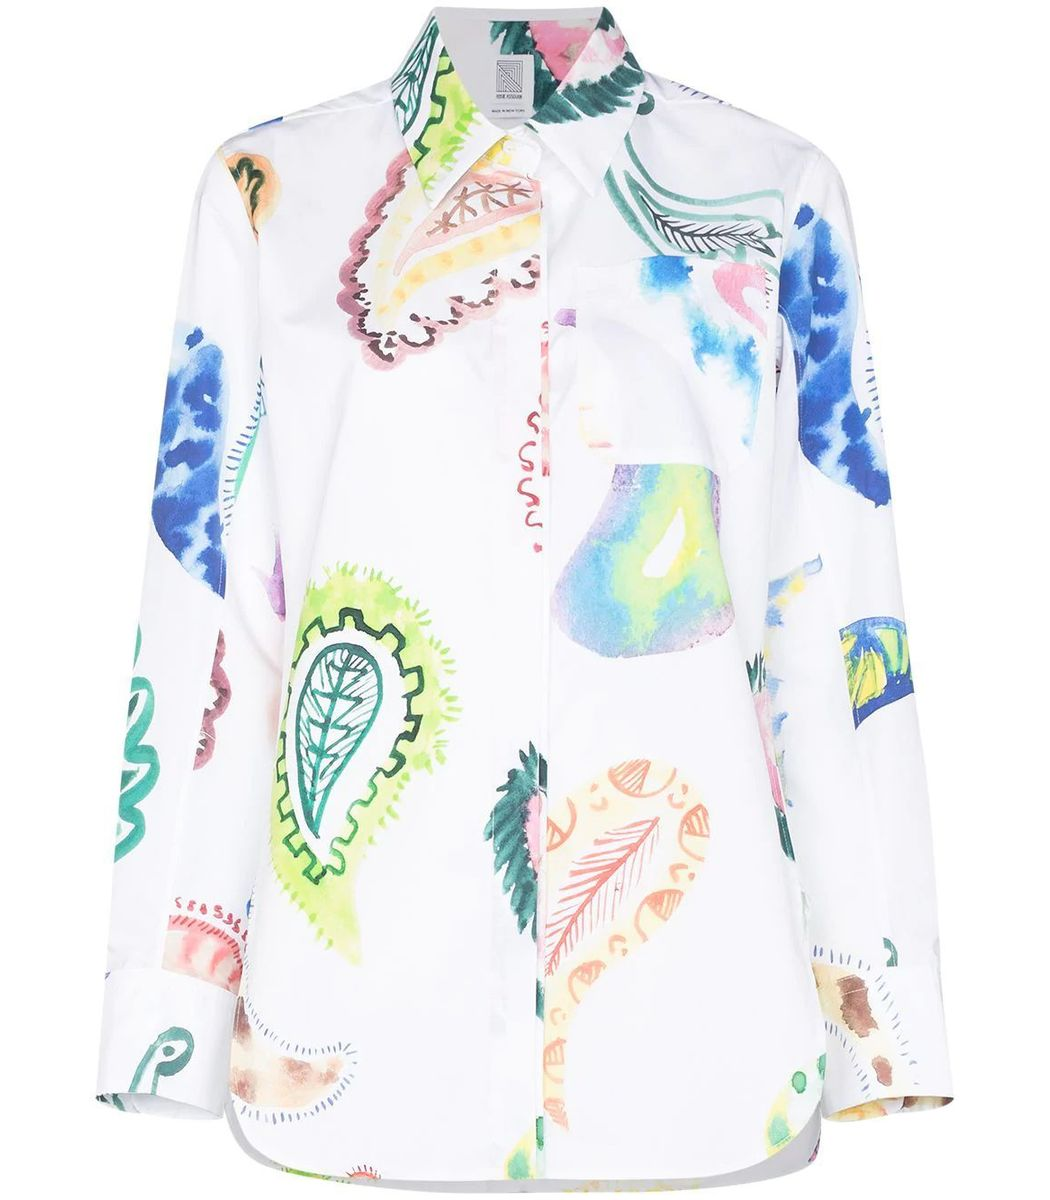 Rosie Assoulin Multicolor Oversize Paisley Print Button Up Shirt